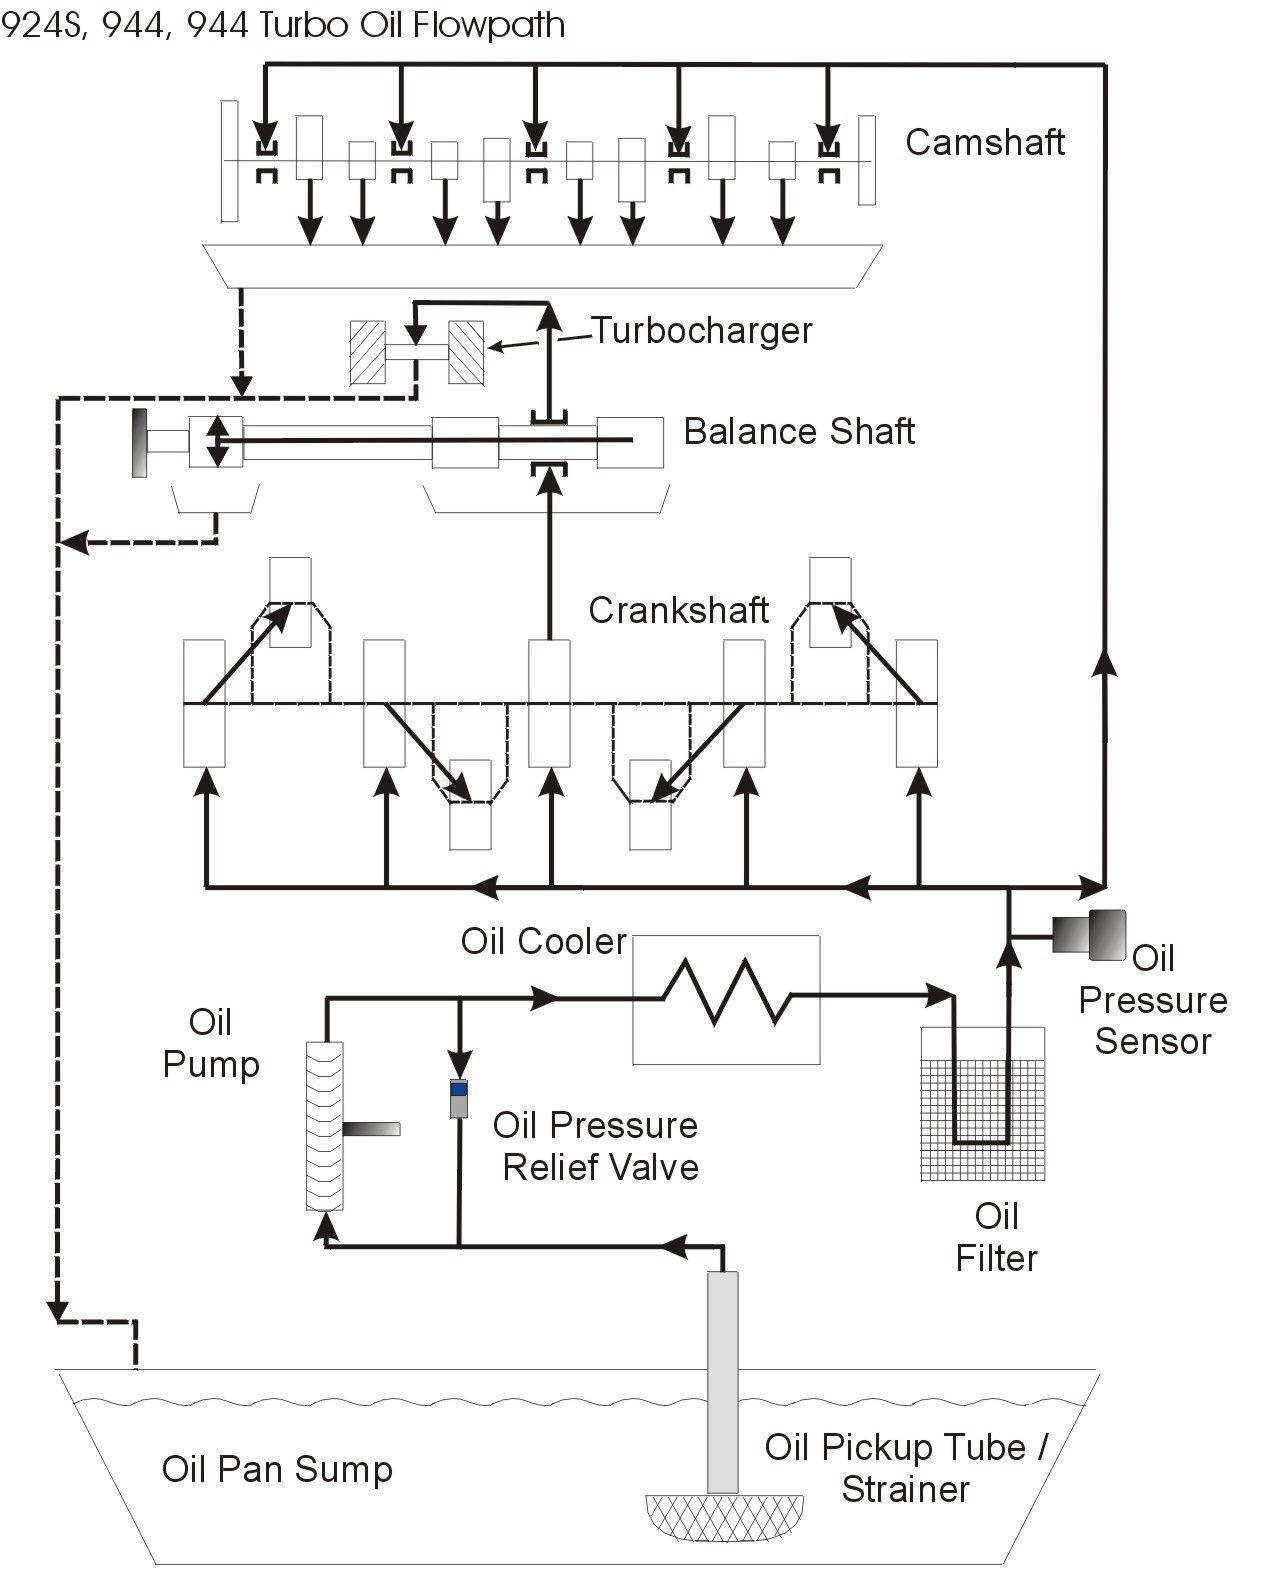 Car Engine Oil Flow Diagram Porsche 944 Engine Oil Flow Porsche Transaxles Pinterest